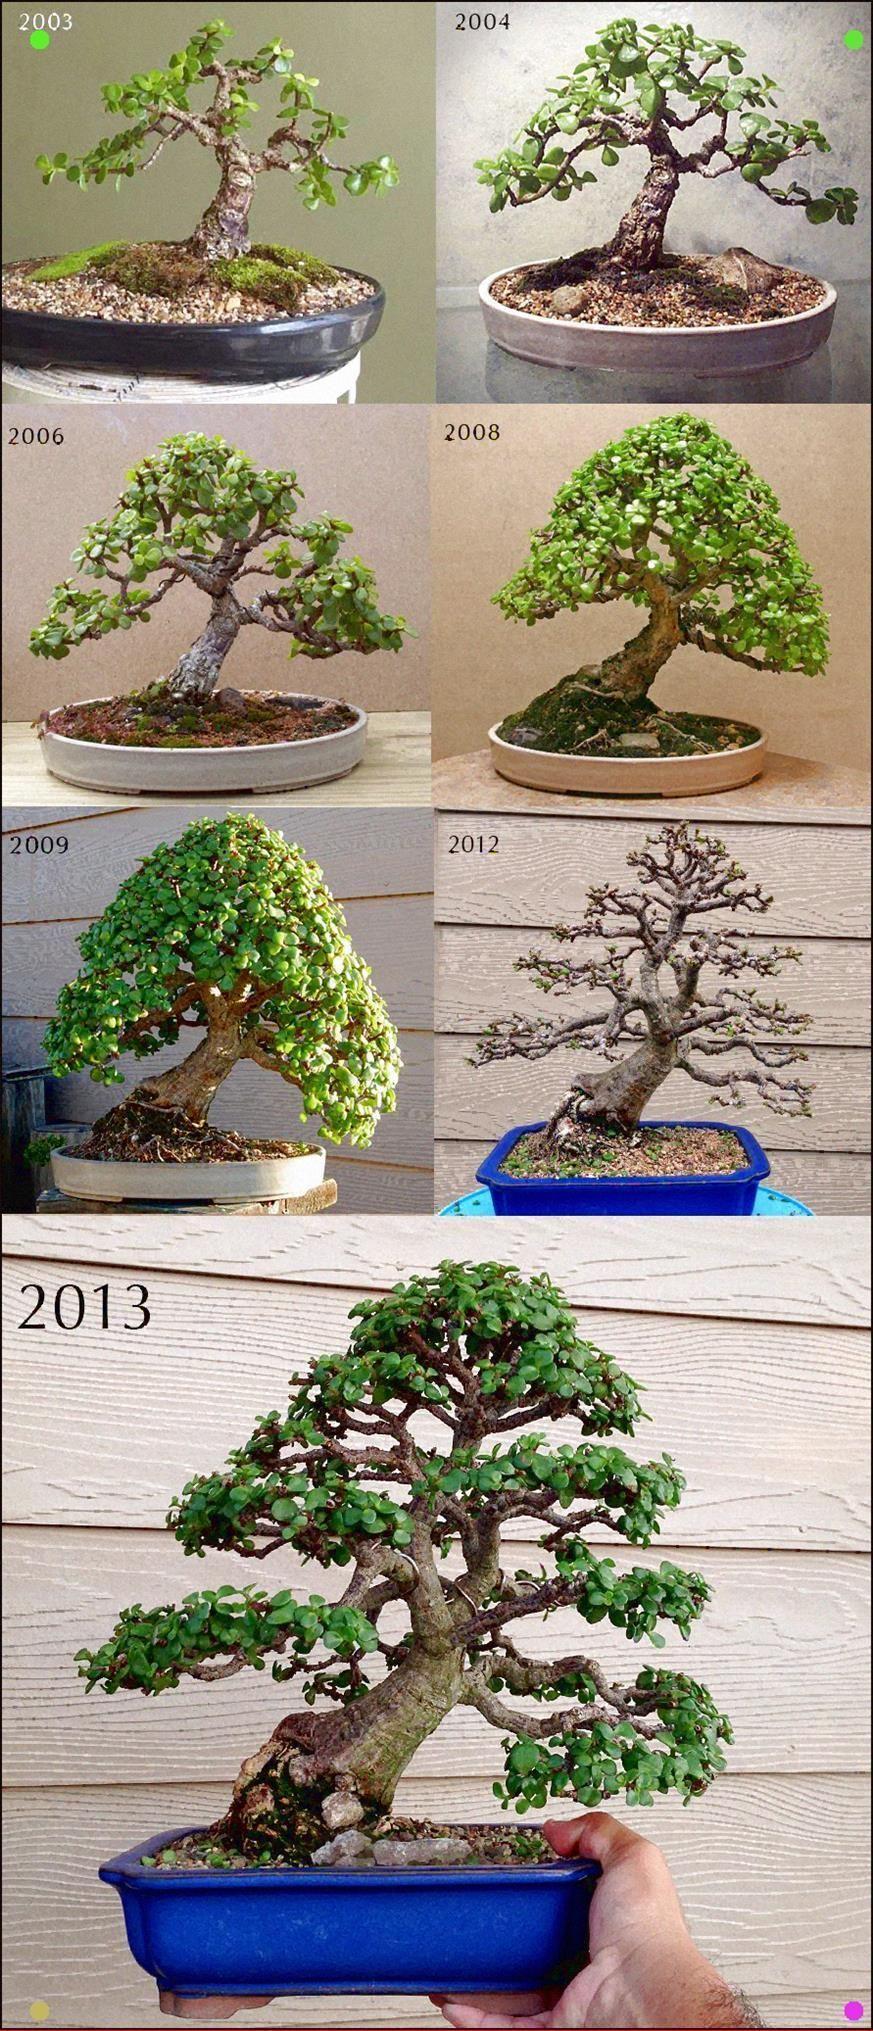 Portulacaria Afra Aka Jade Bonsai Bonsai Trees Bonsai Styles More At Fosterginger Pinterest Bonsai Tree Buy Bonsai Tree Jade Bonsai